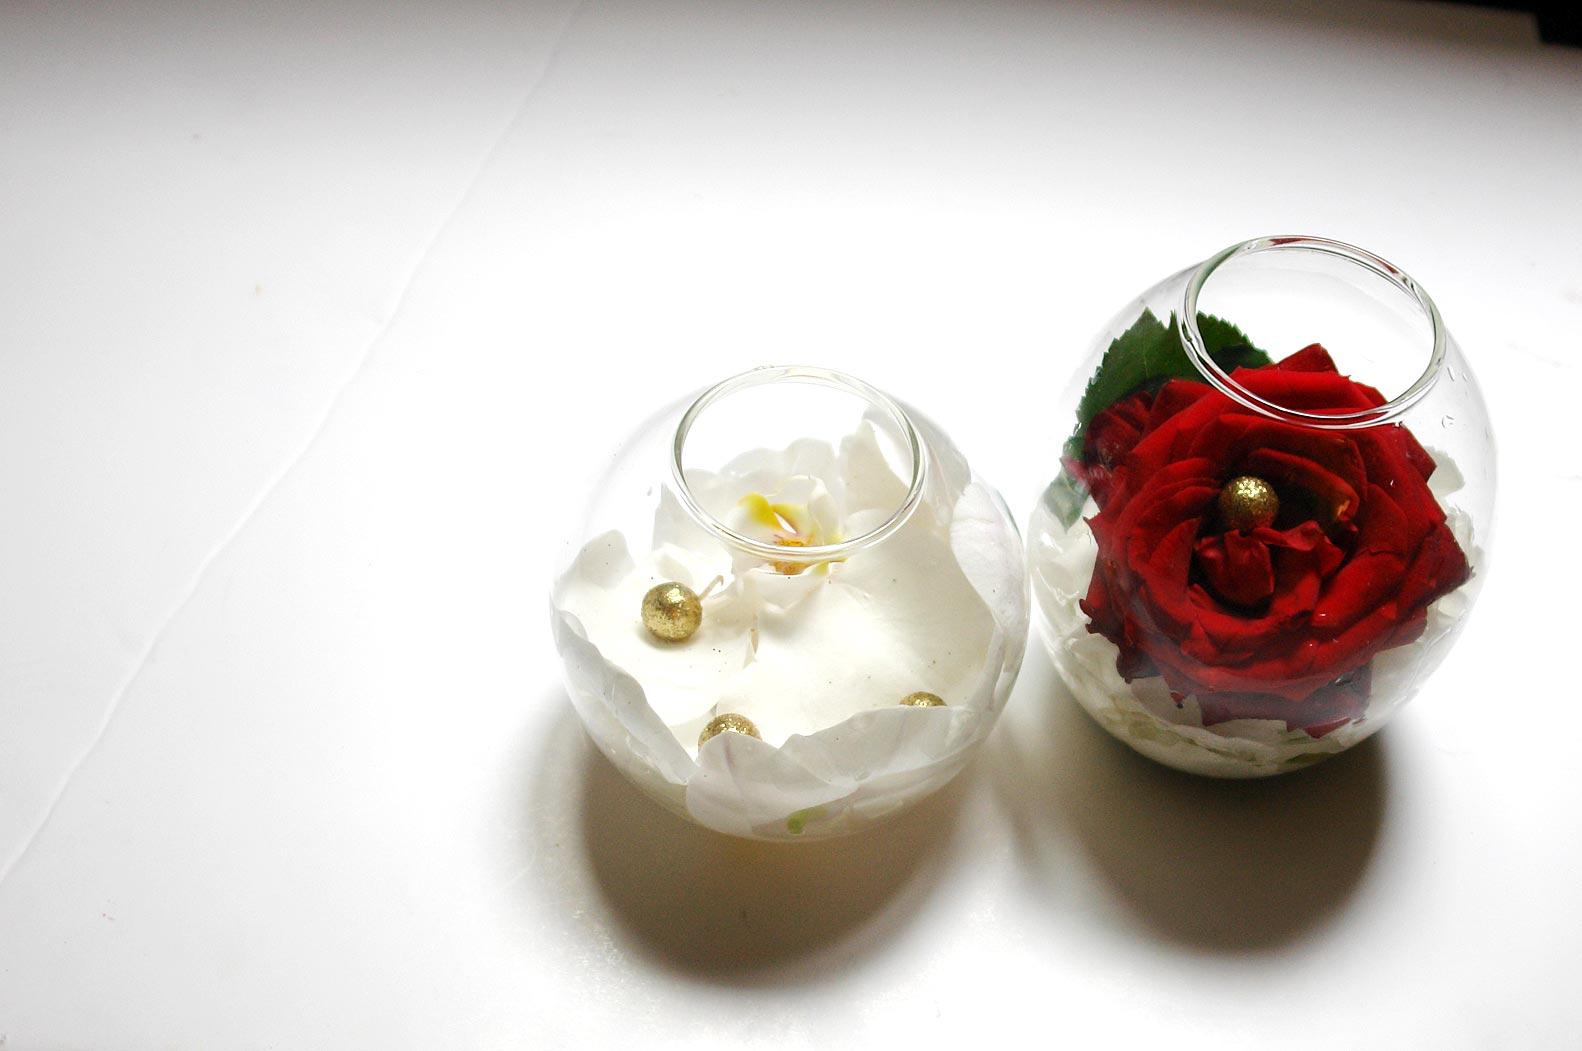 atelier floral avec partylite l 39 h tel george v glose blog lifestyle paris. Black Bedroom Furniture Sets. Home Design Ideas